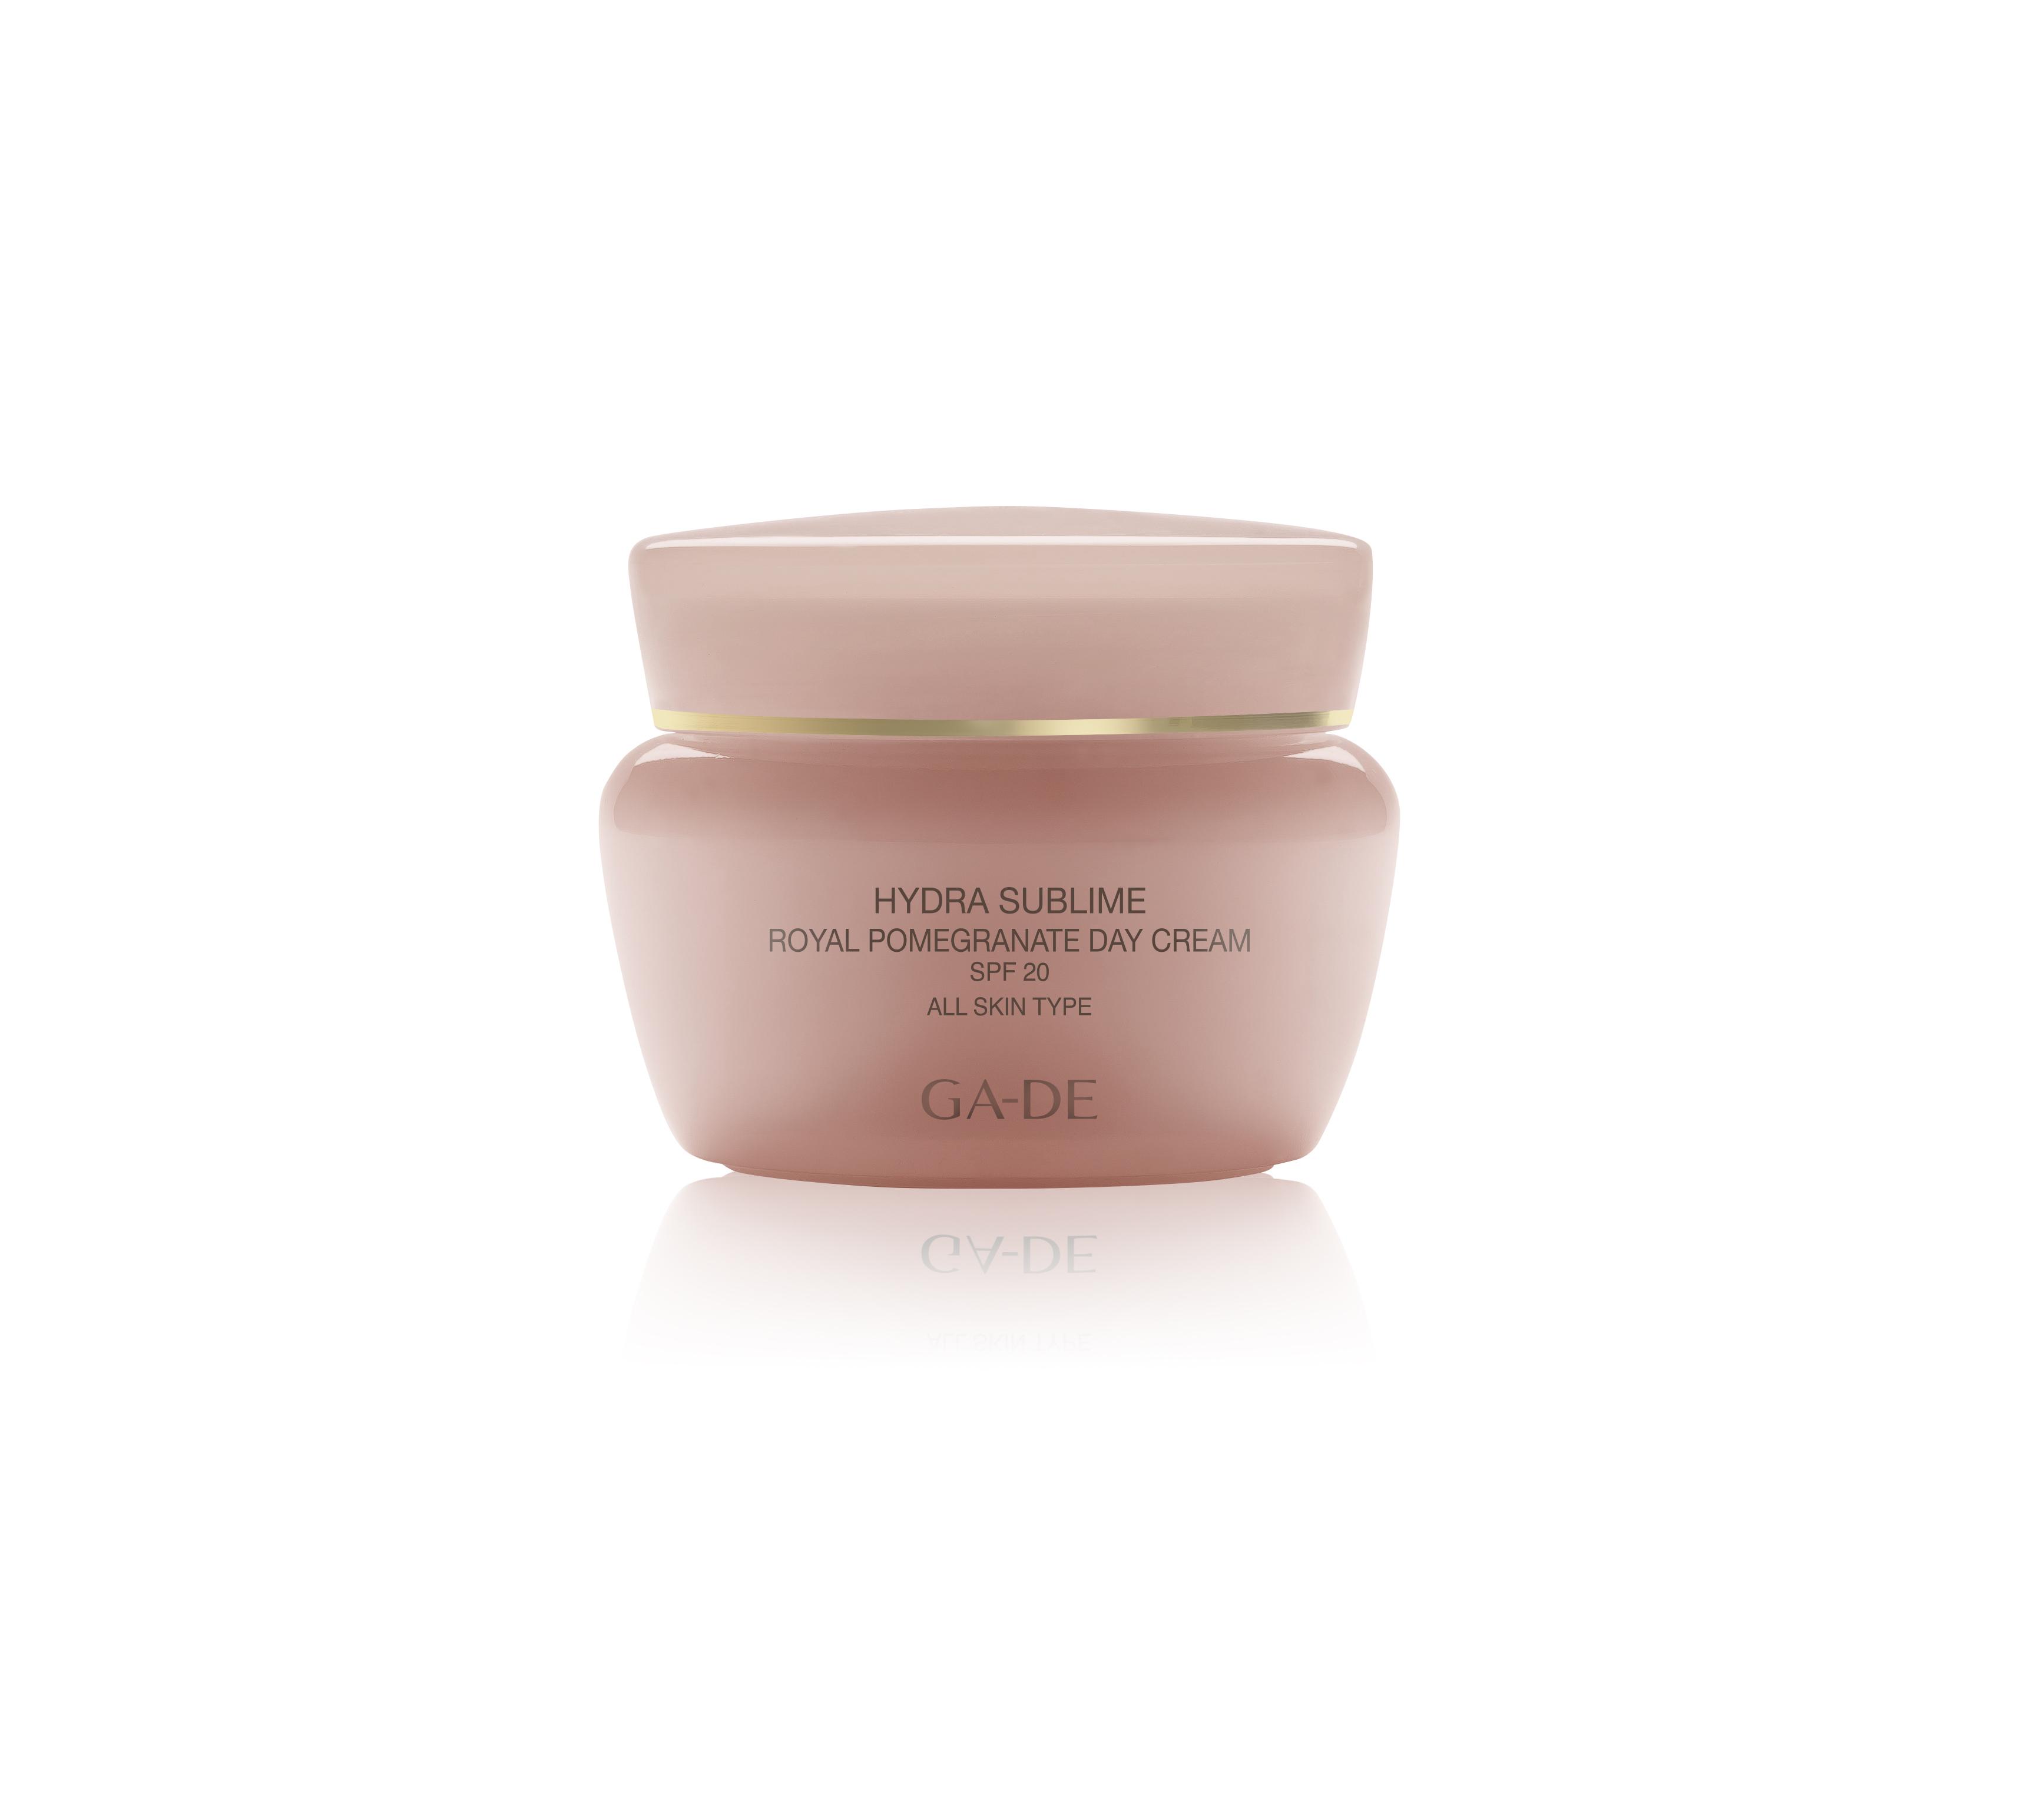 Увлажняющий крем - Hydra Sublime Royal Pomegranate Day Cream SPF 20